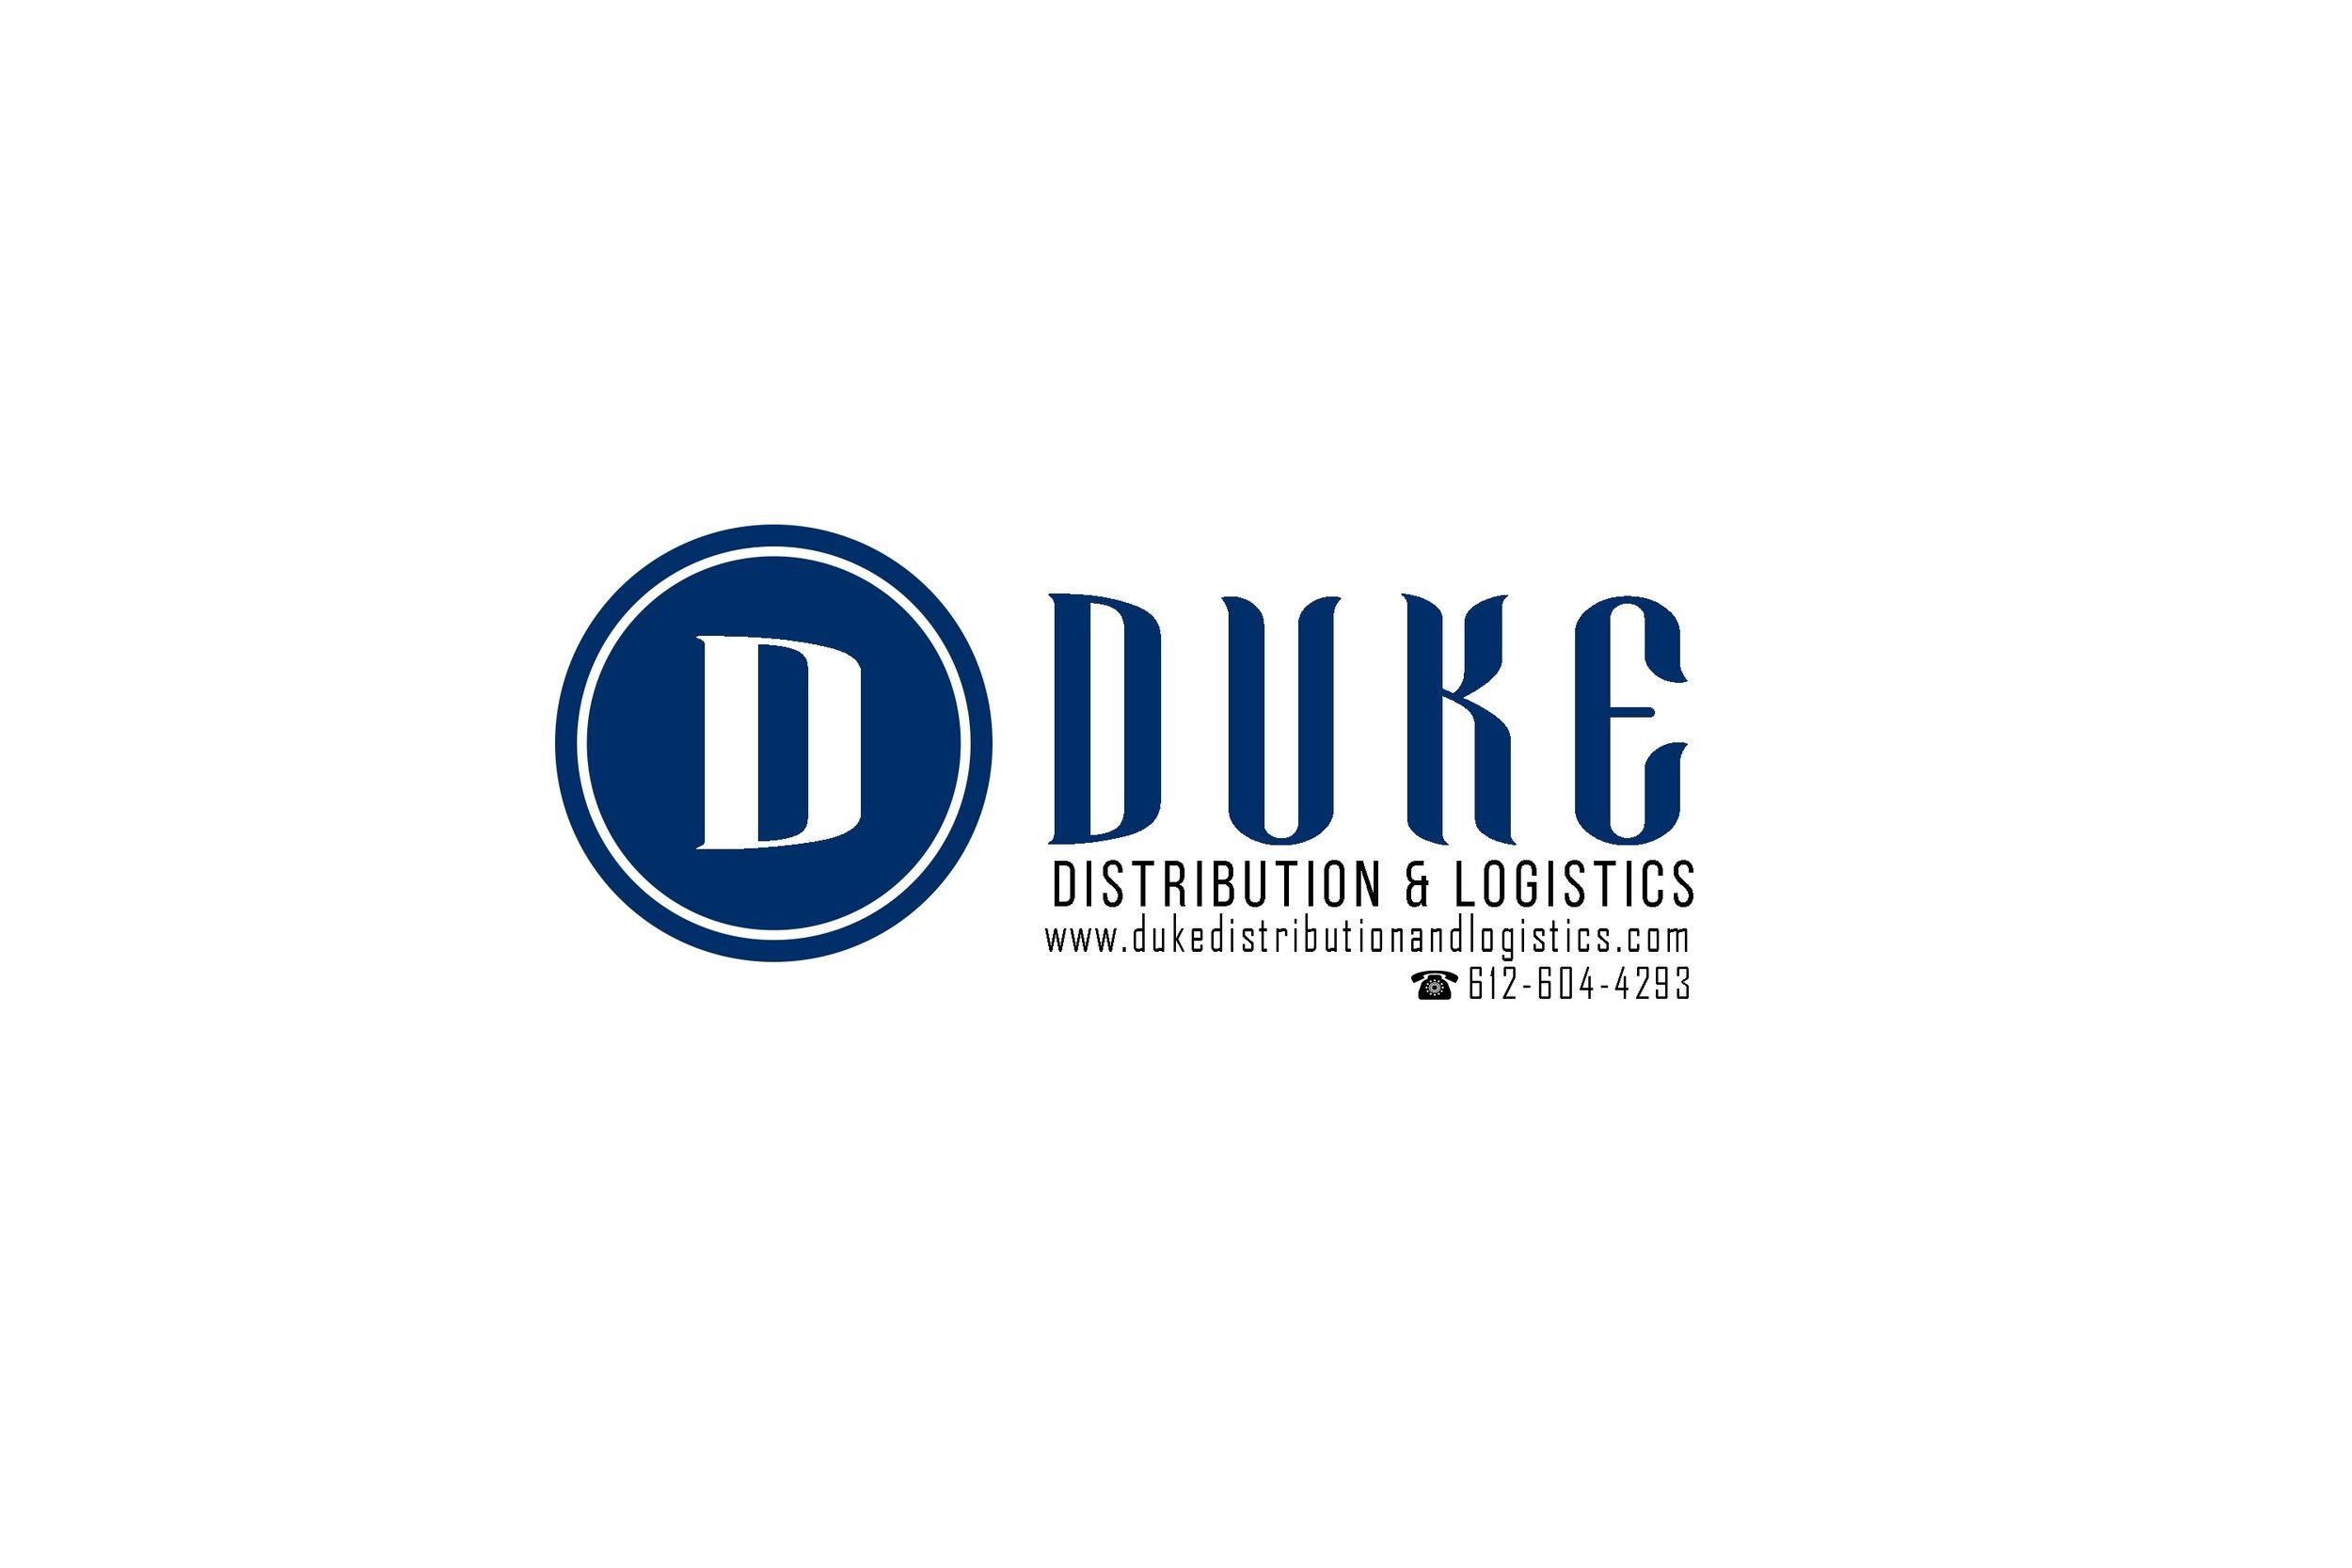 duke distro logo blue white.jpg